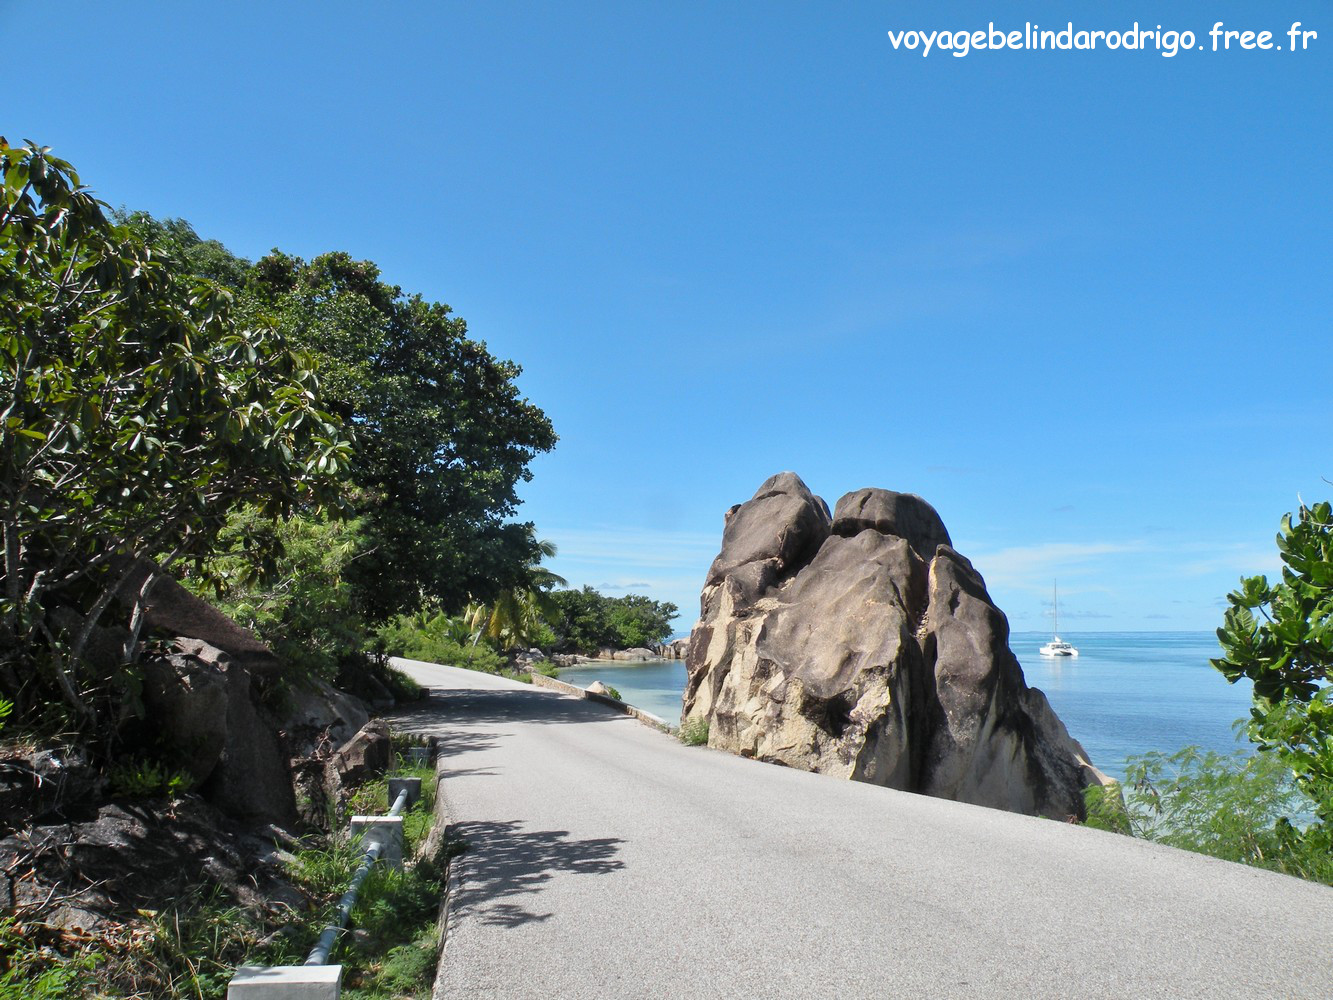 Route de Consolation - Praslin